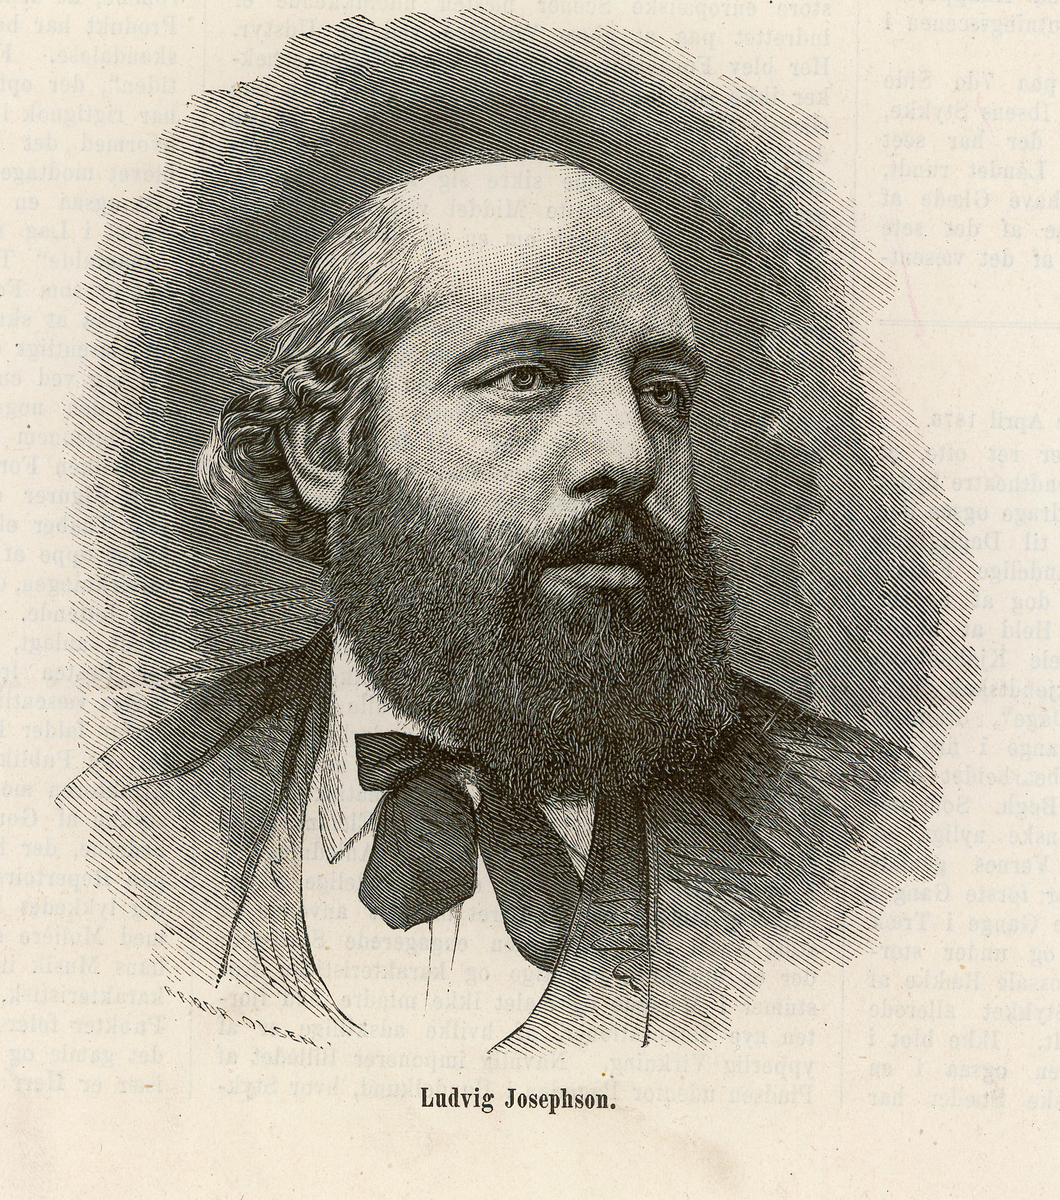 Josephson, Ludvig Oscar (1832 - 1899)